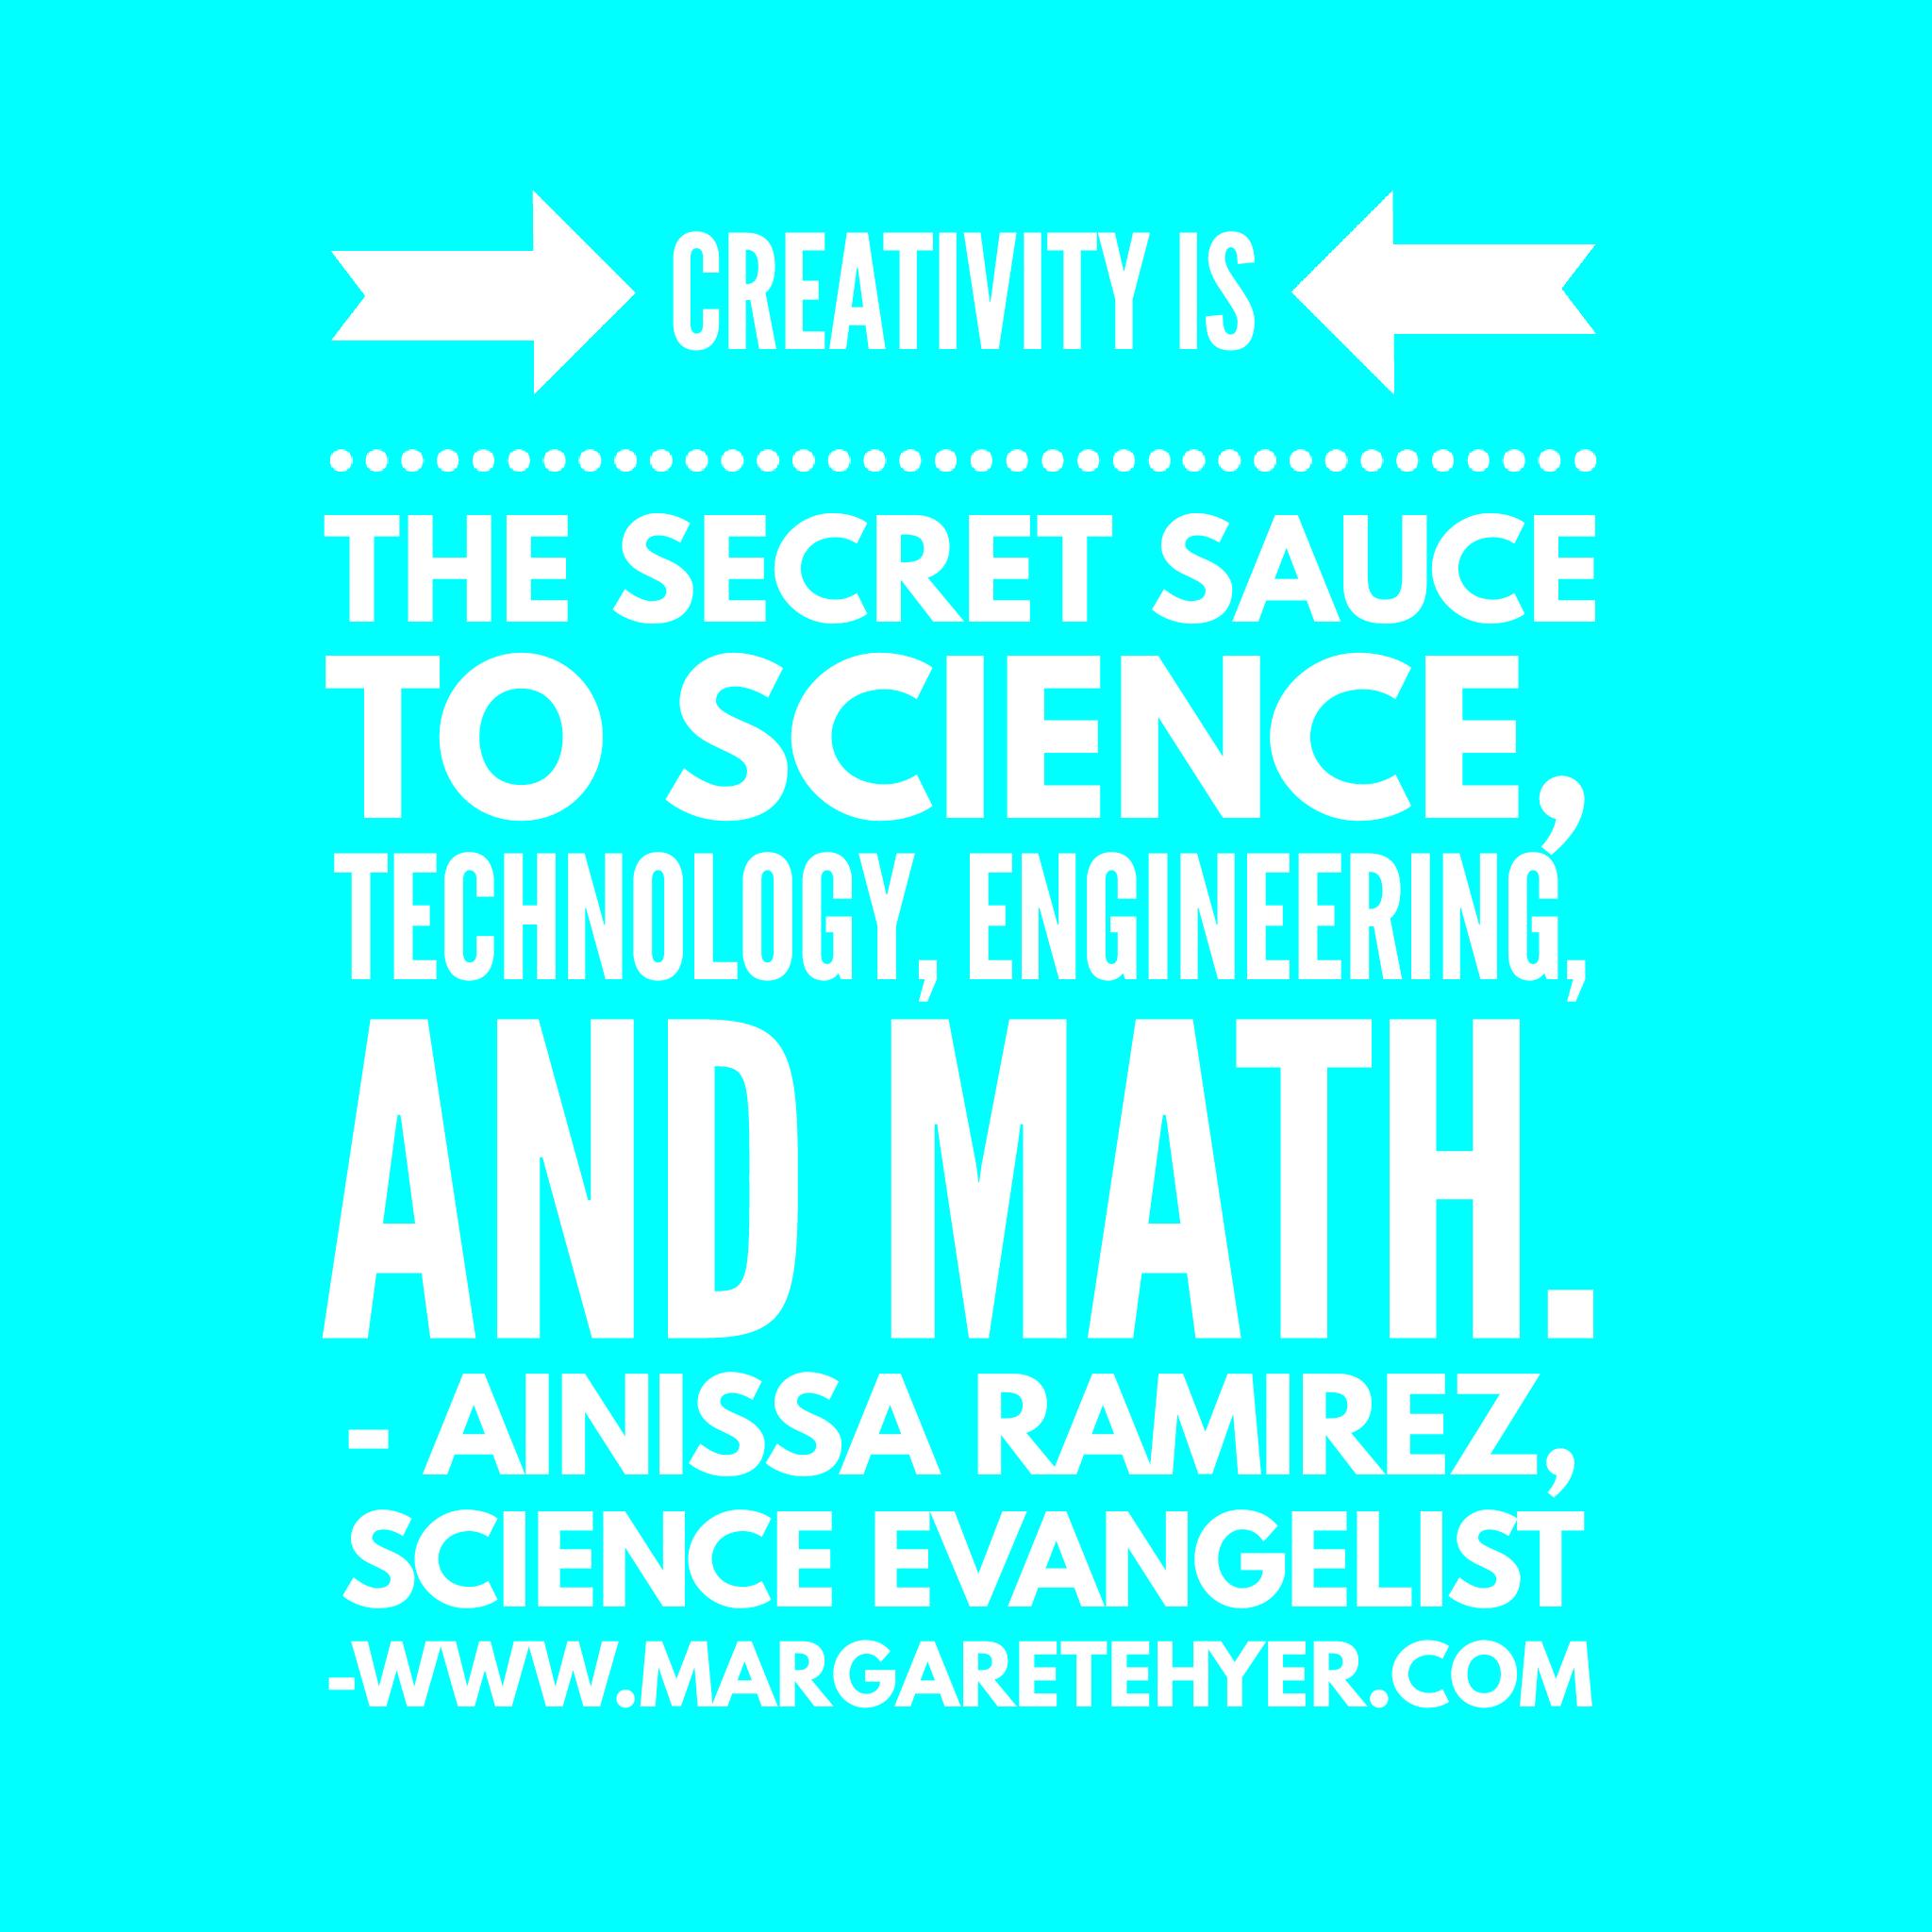 Creativity is the secret sauce to science, technology, engineering, and math. Ainissa Ramirez, Science Evangelist